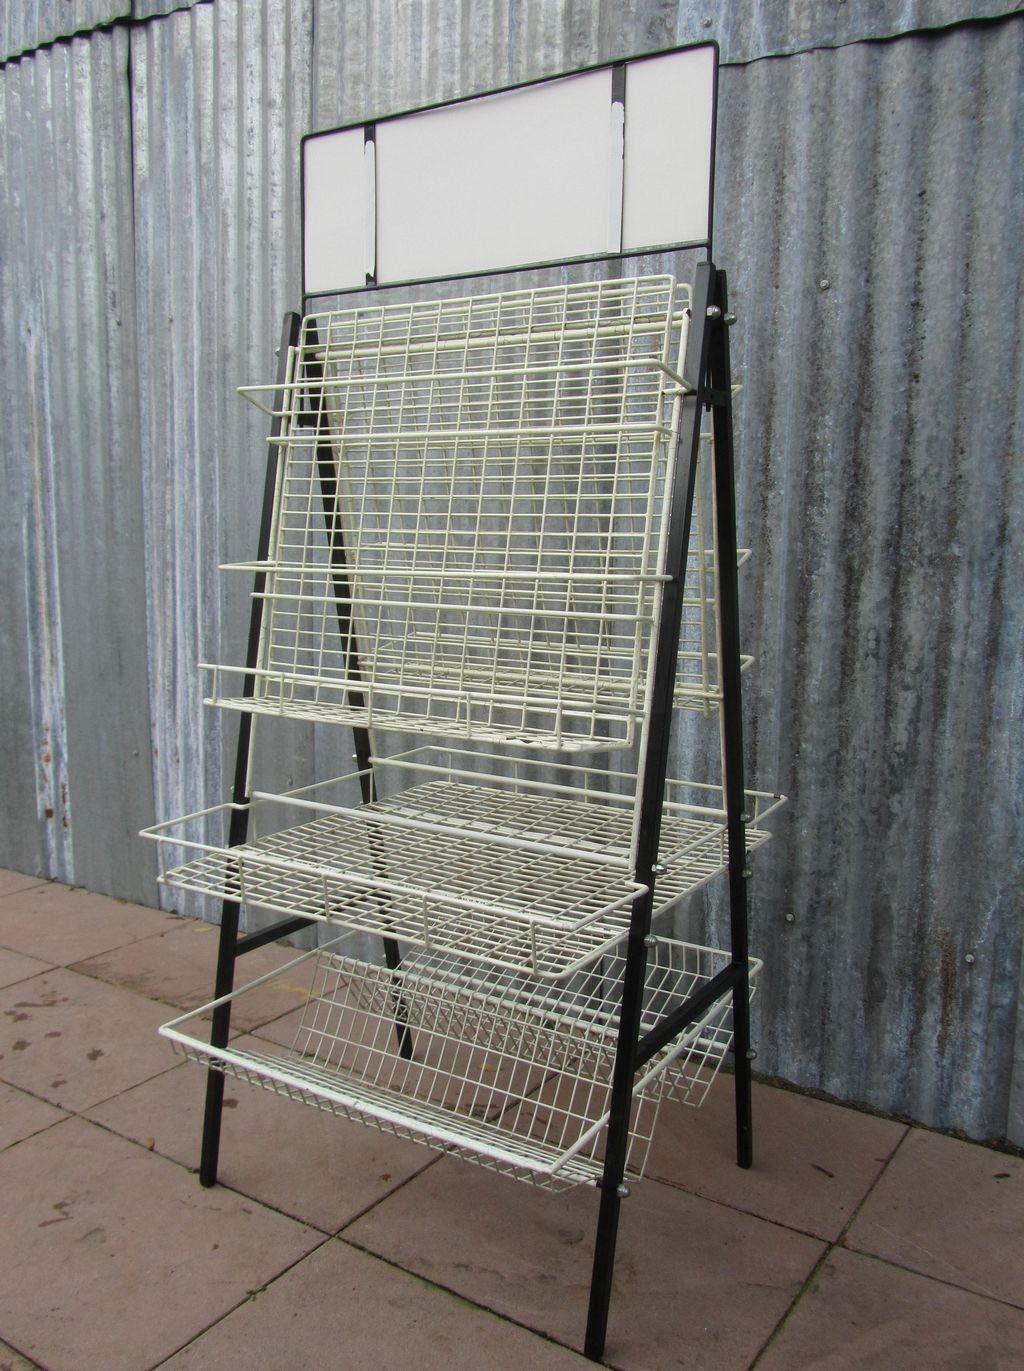 Metalen Opbergrek Zwart.Mooi Vintage Industrieel Winkelrek Display Opbergrek Zwart